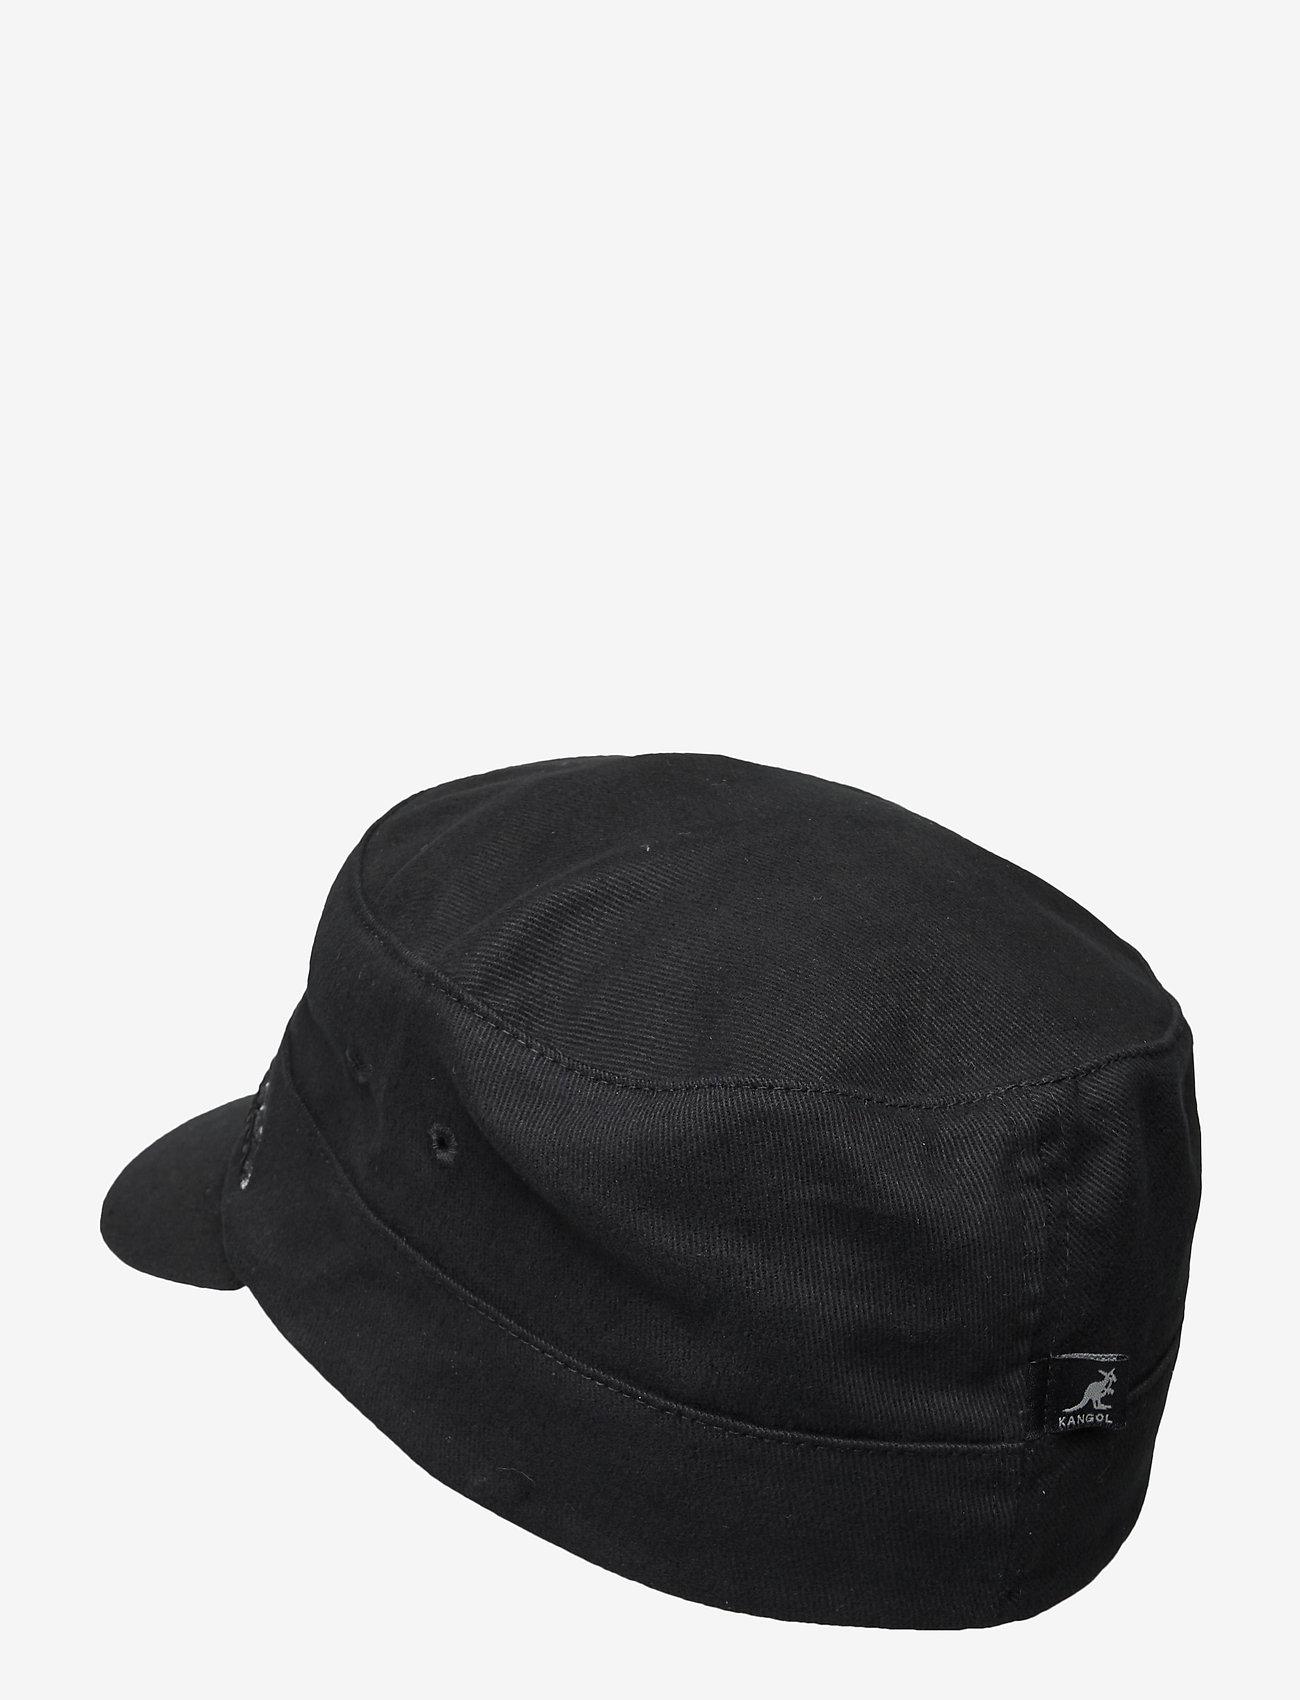 Kangol - KG COTTON TWILL ARMY CAP - kasketter - black - 1